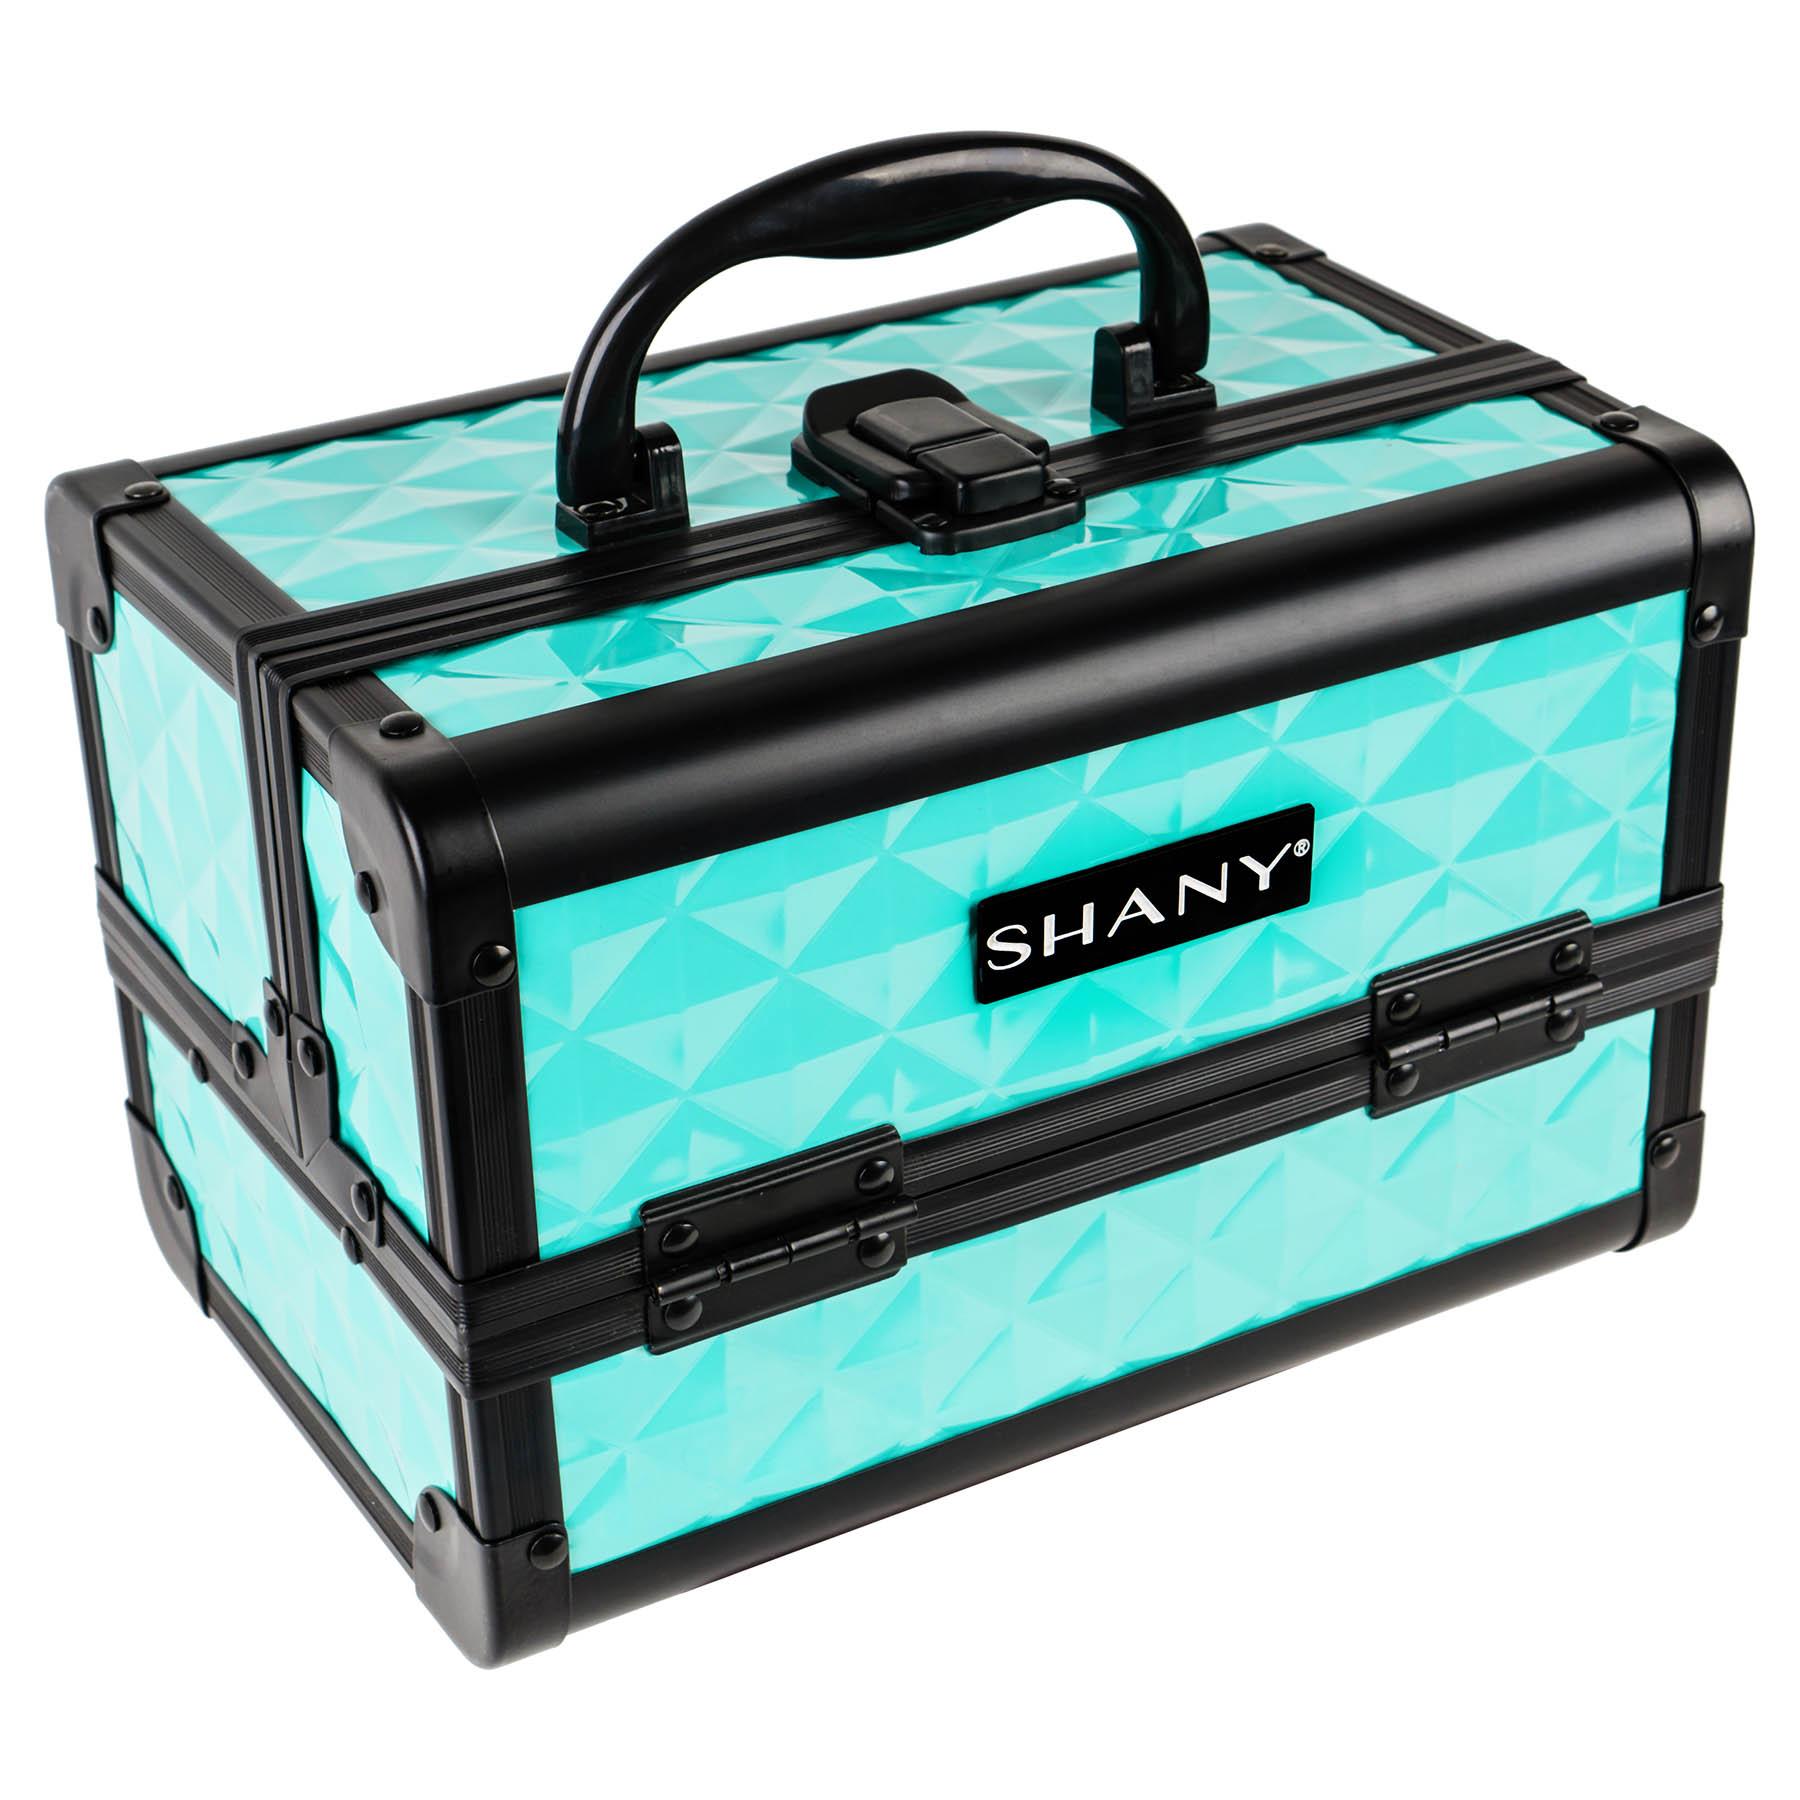 SHANY-Mini-Makeup-Train-Case-With-Mirror miniature 77